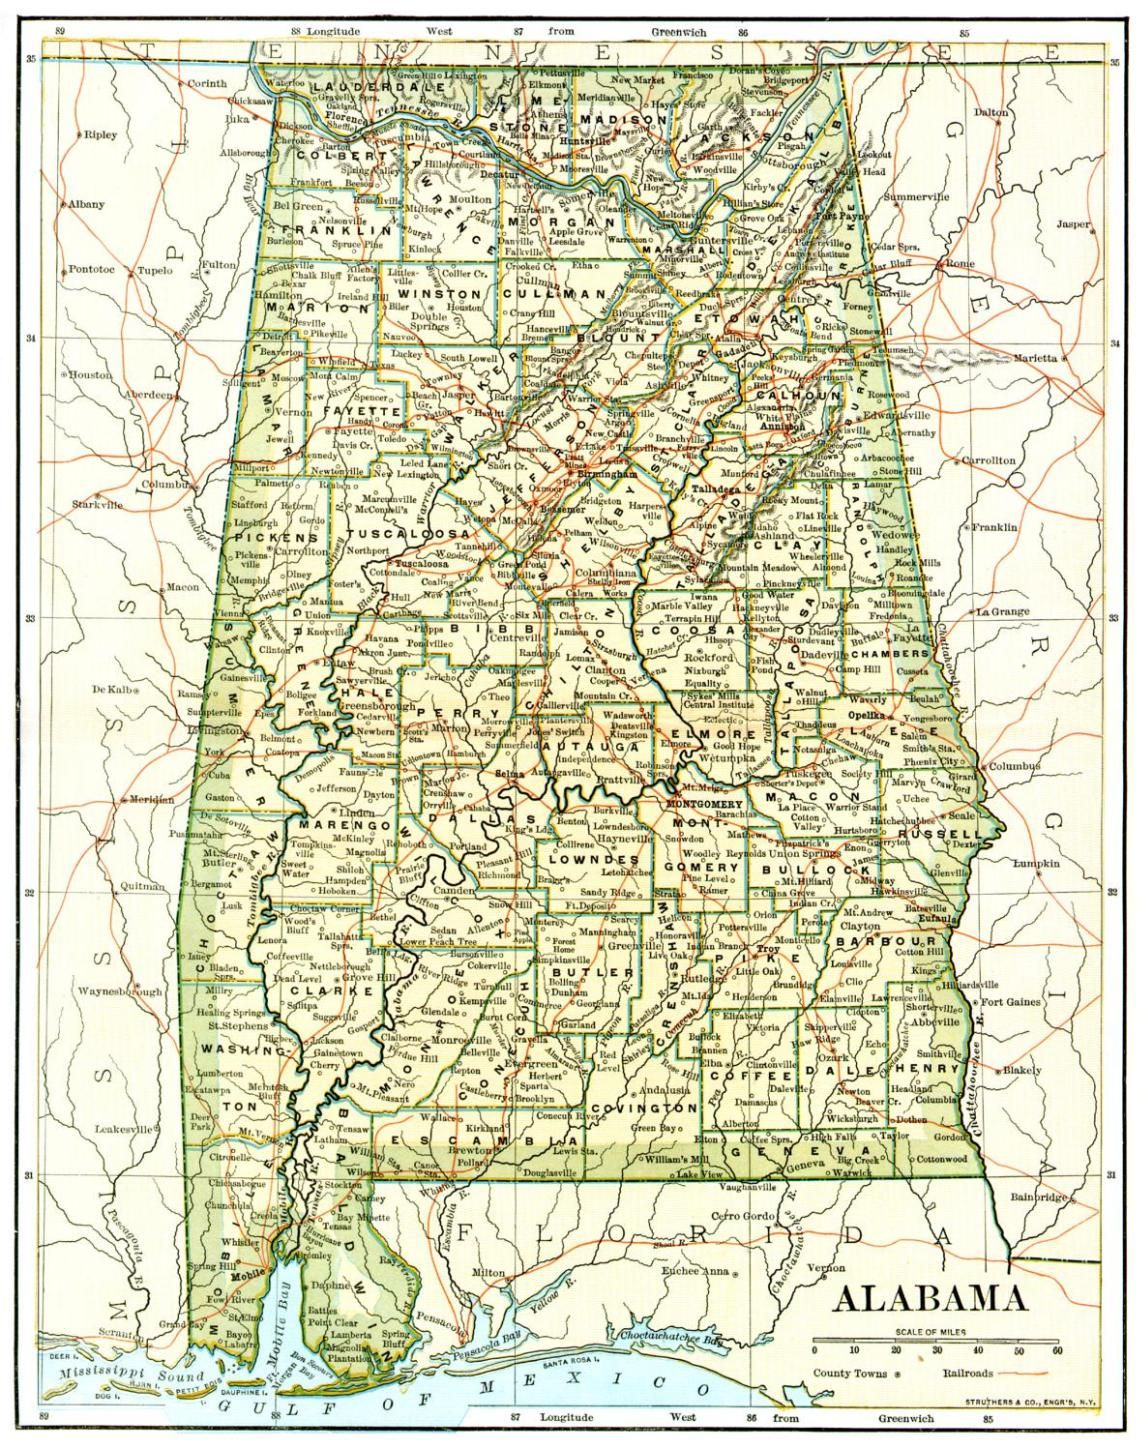 State of Alabama ... | Alabama | Alabama, Sweet home alabama ... on map of georgia alabama line, map of counties of georgia, map of georgia geology, county map georgia and alabama, map mississippi and alabama, map tuscaloosa al, map of lagrange georgia, map of sw georgia, map of southern montana, map tennessee and alabama, map of northwest ga,